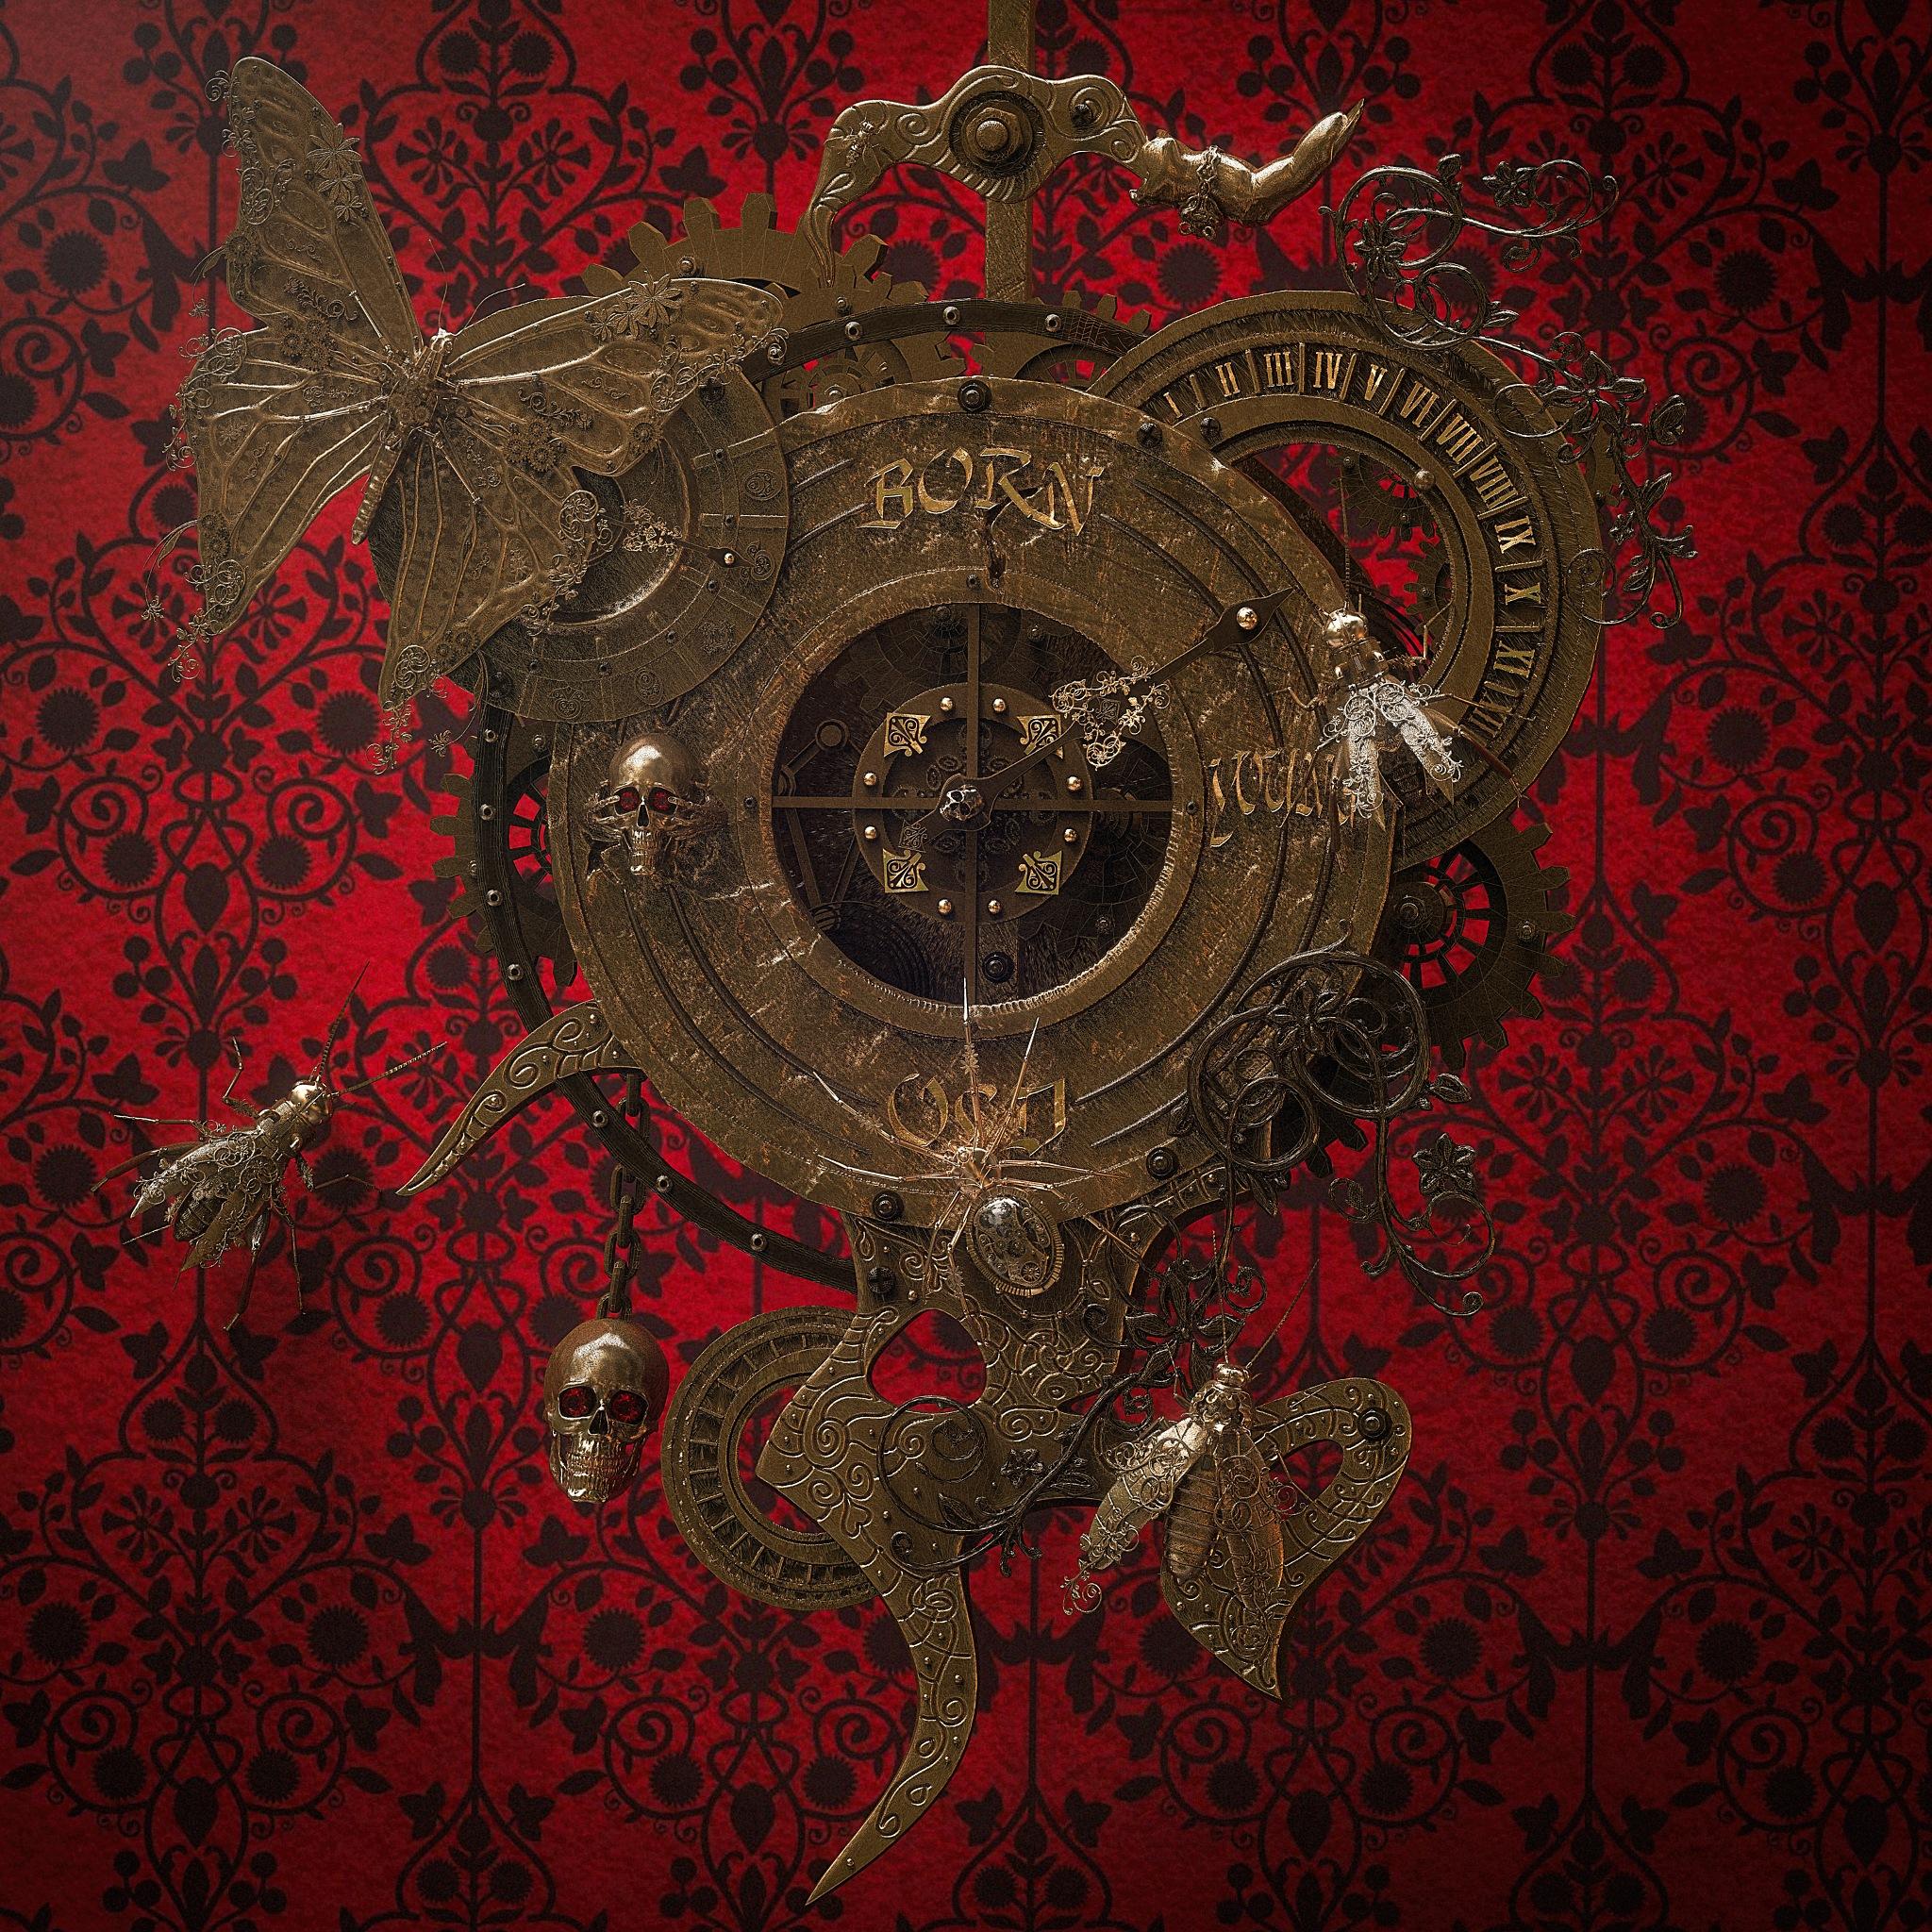 """Steampunk Clock"" by Oliver Kieser"